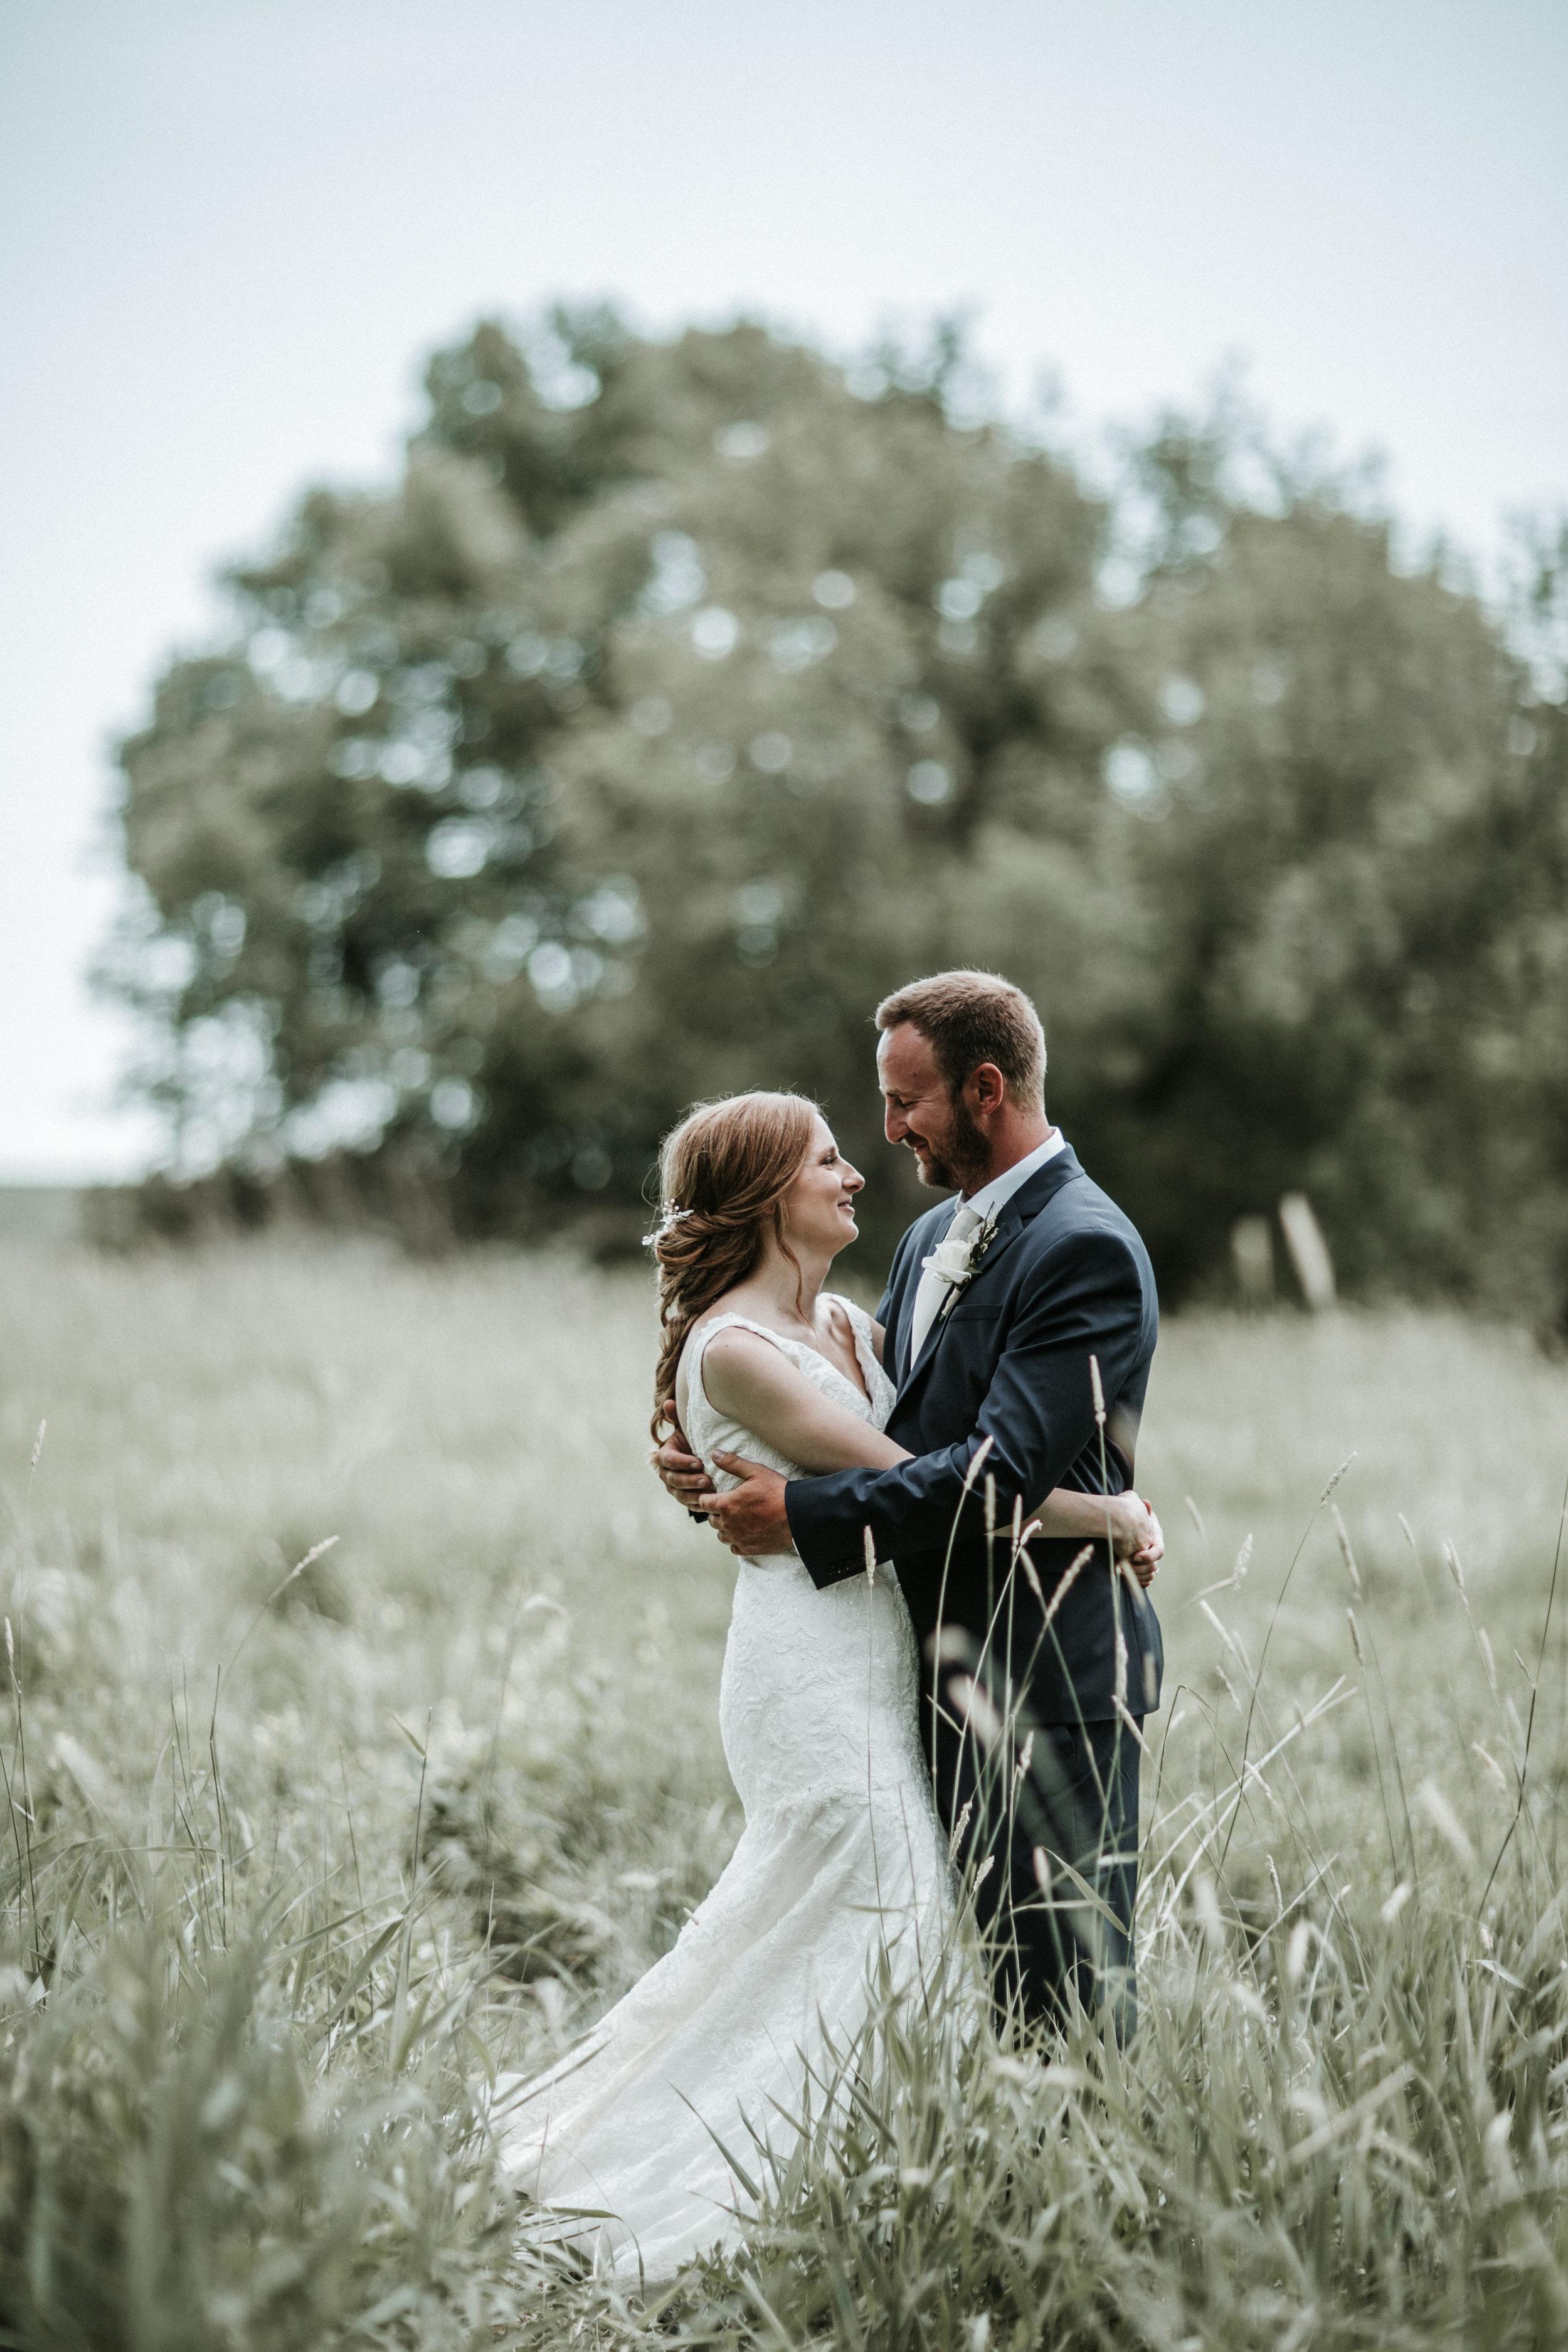 weddingblogsmall-9375.jpg